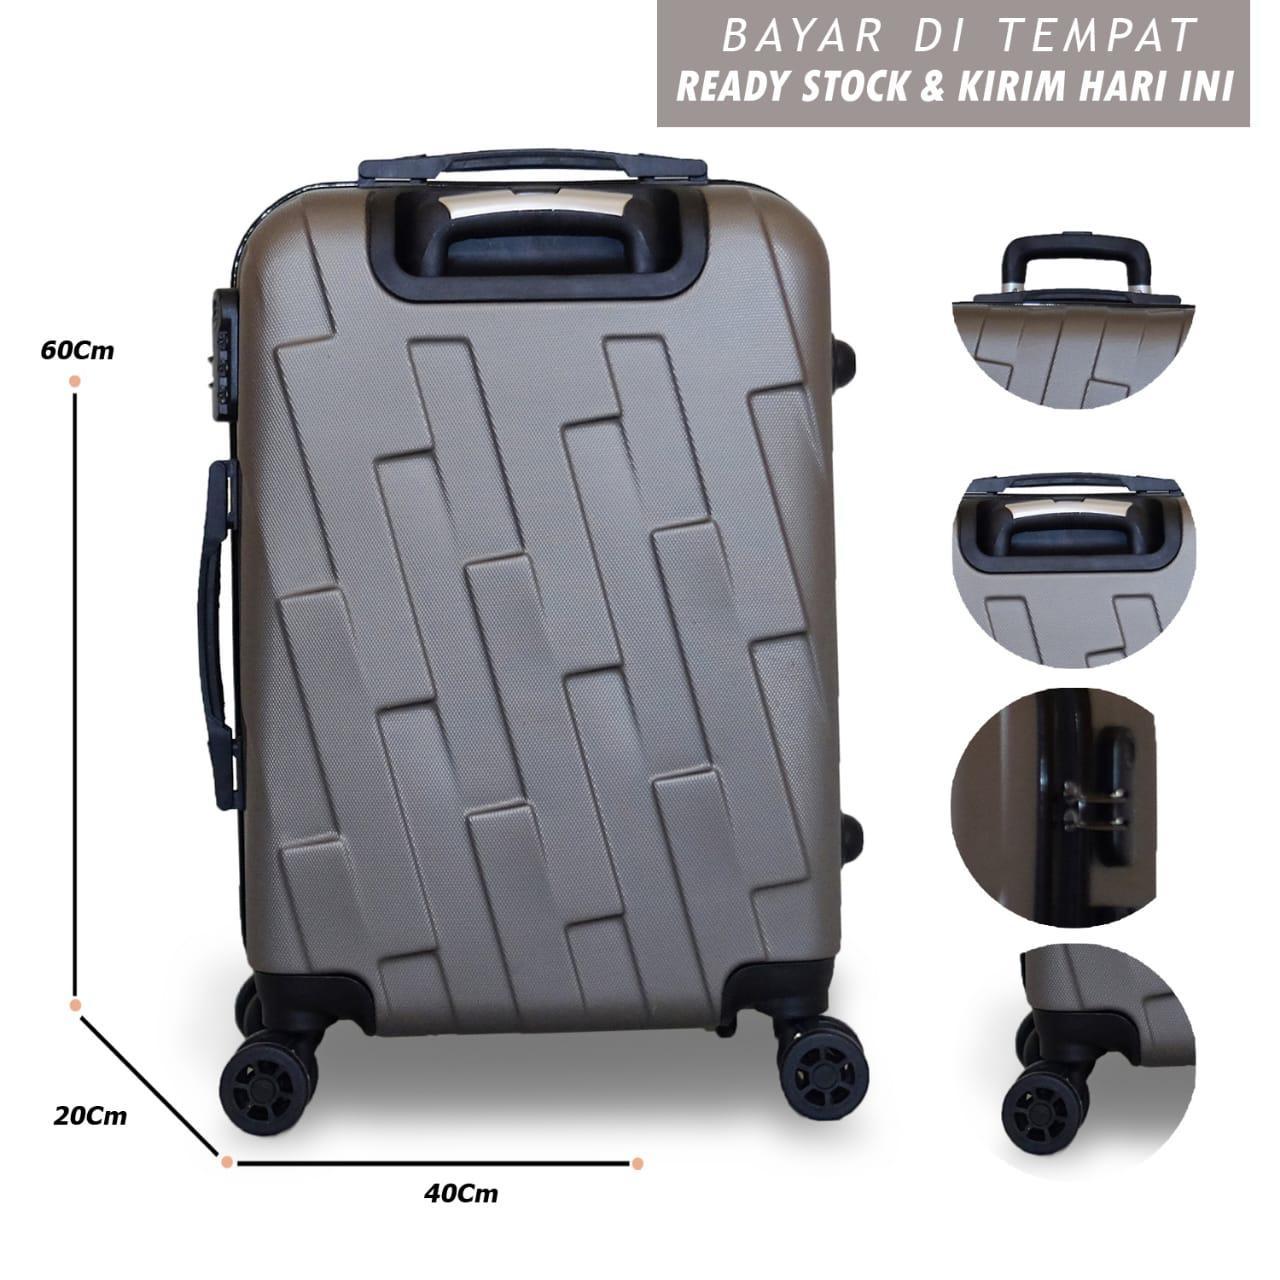 Detail Gambar Koper Polo UVO Hardcase Luggage 21 Inchi 804-20 Silver  Waterproof Terbaru 20e613d55c